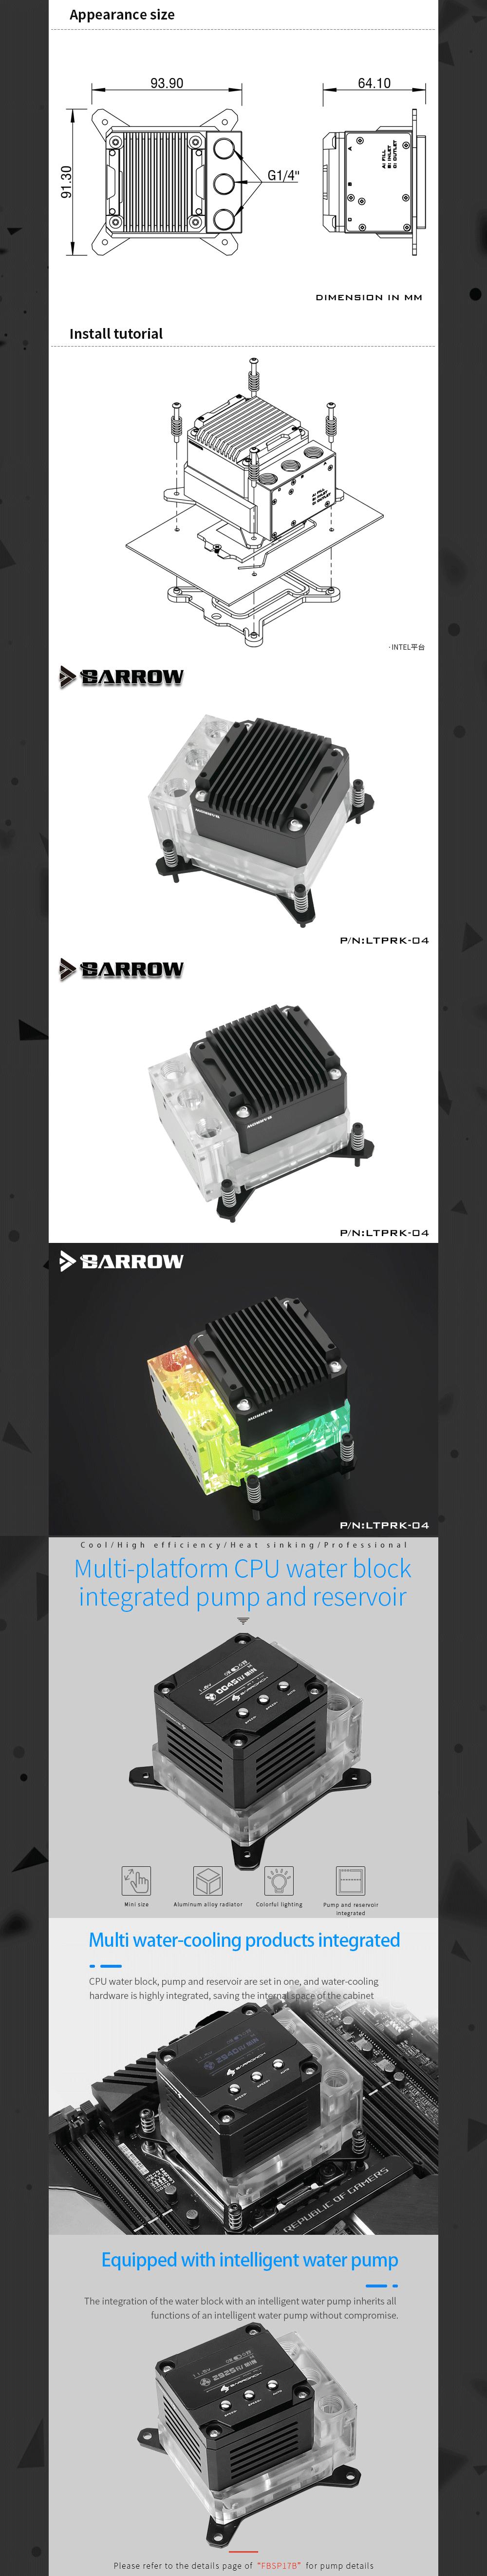 Barrowch Acrylic CPU Block Pump Reservoir 17W PWM Intelligent Pump Three In One OLED Digital Display, FBLTPRK-04/LTPRK-04